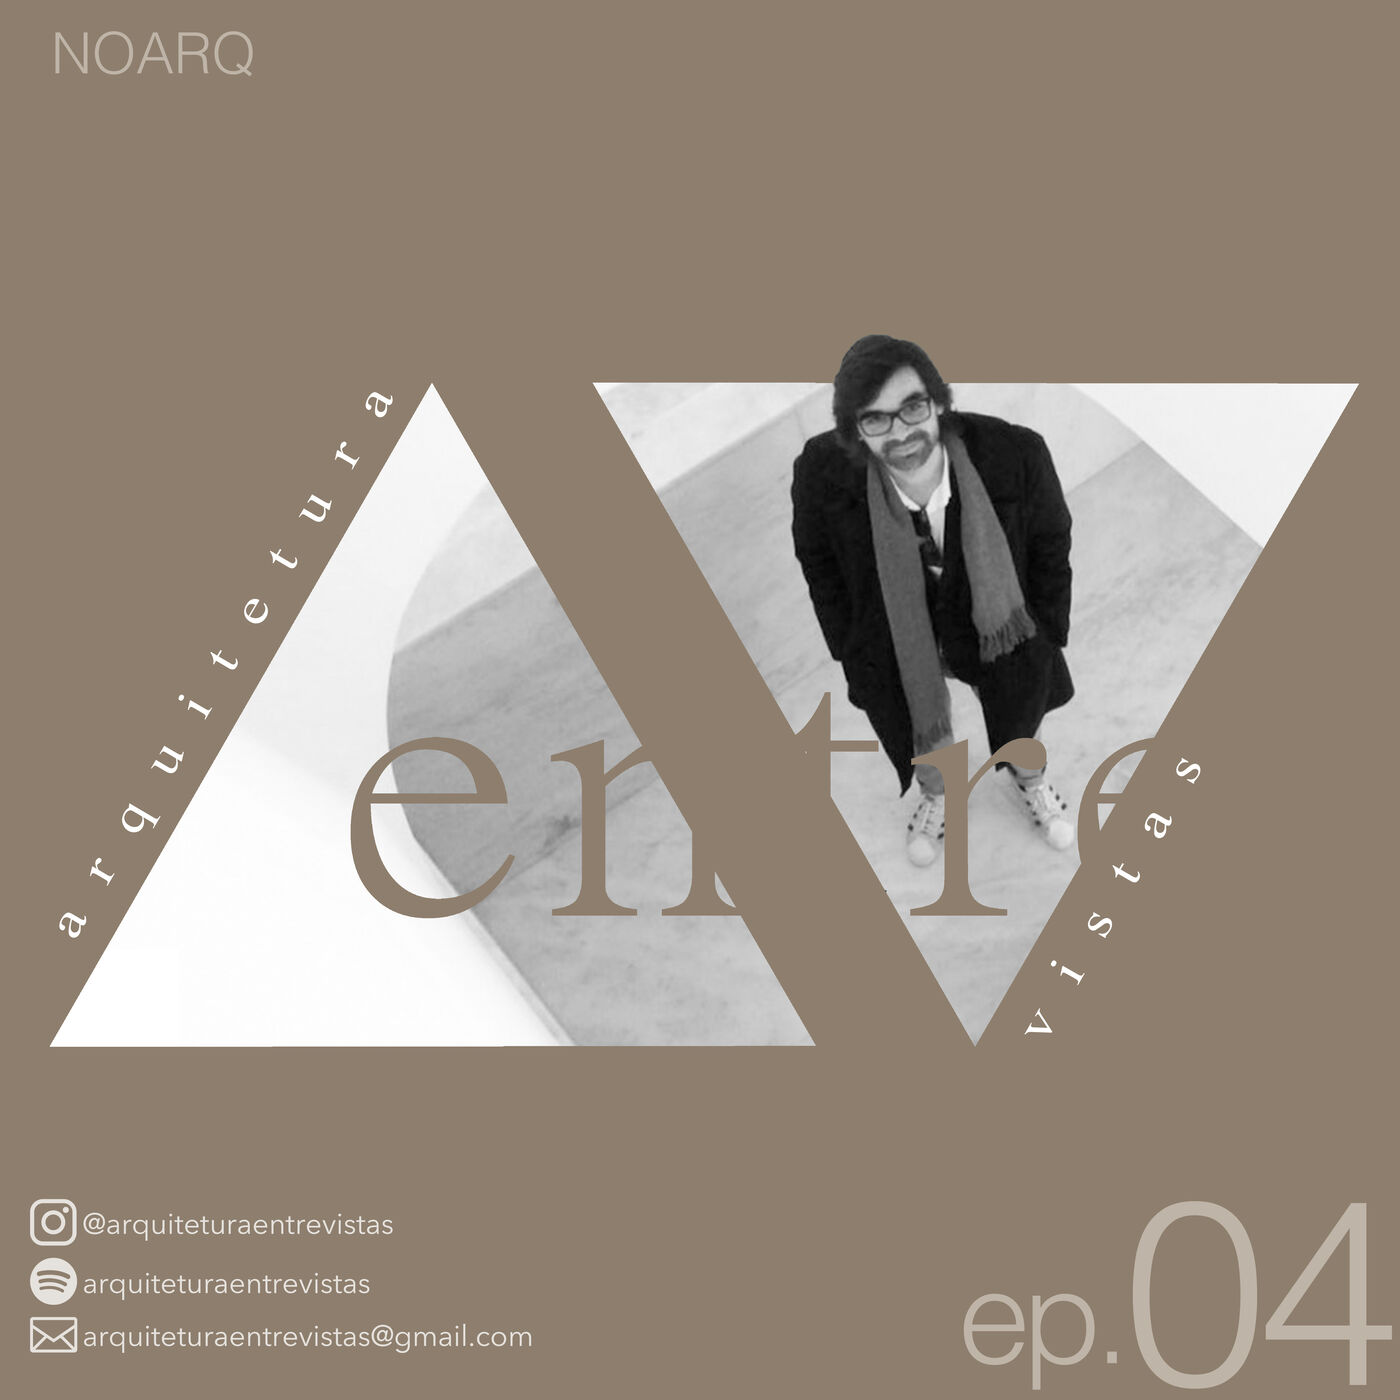 EP.4 NOARQ, Arquitetura Entre Vistas